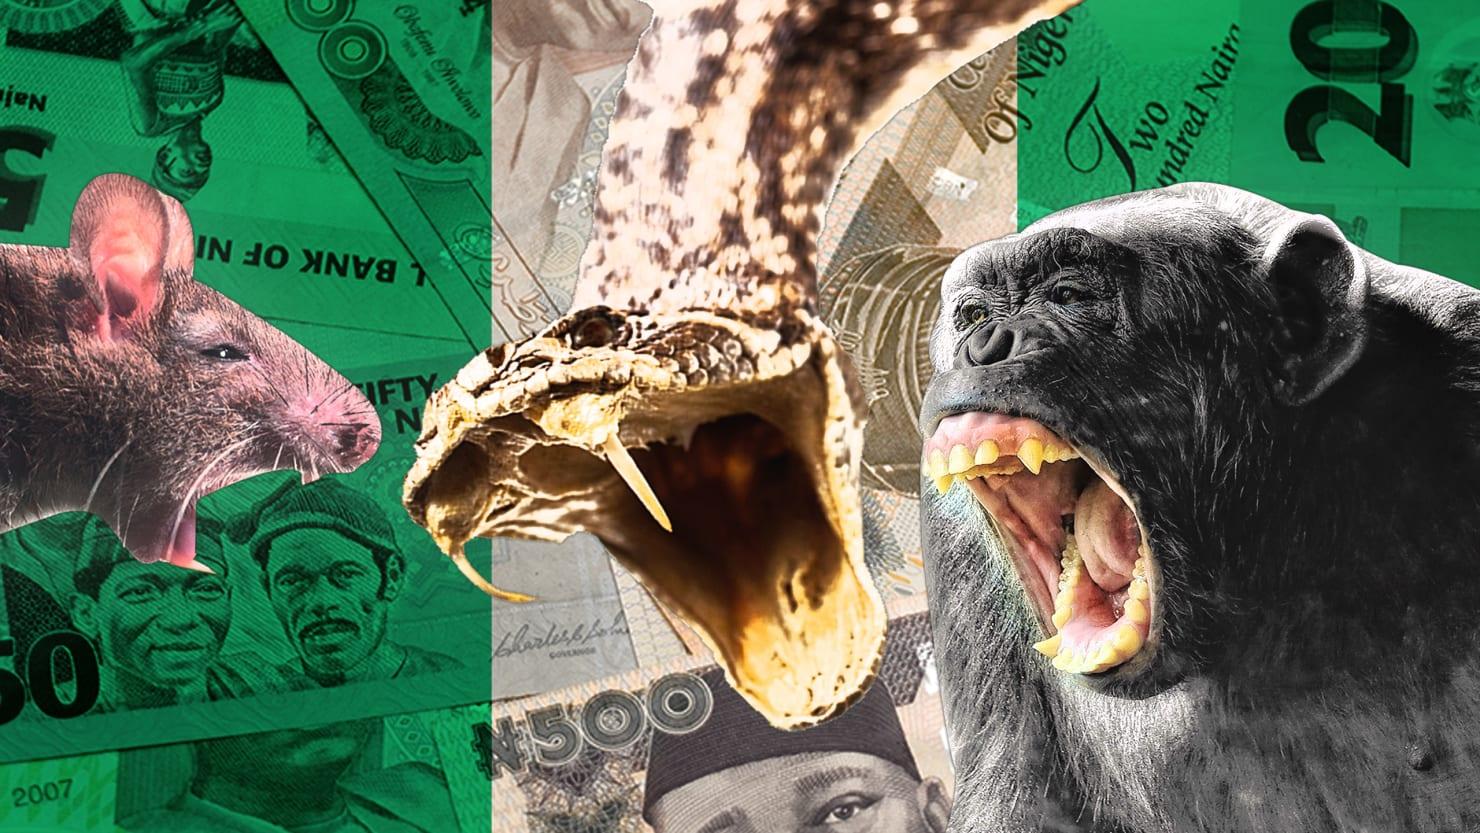 how animals  u2018stole u2019  300k from officials in nigeria